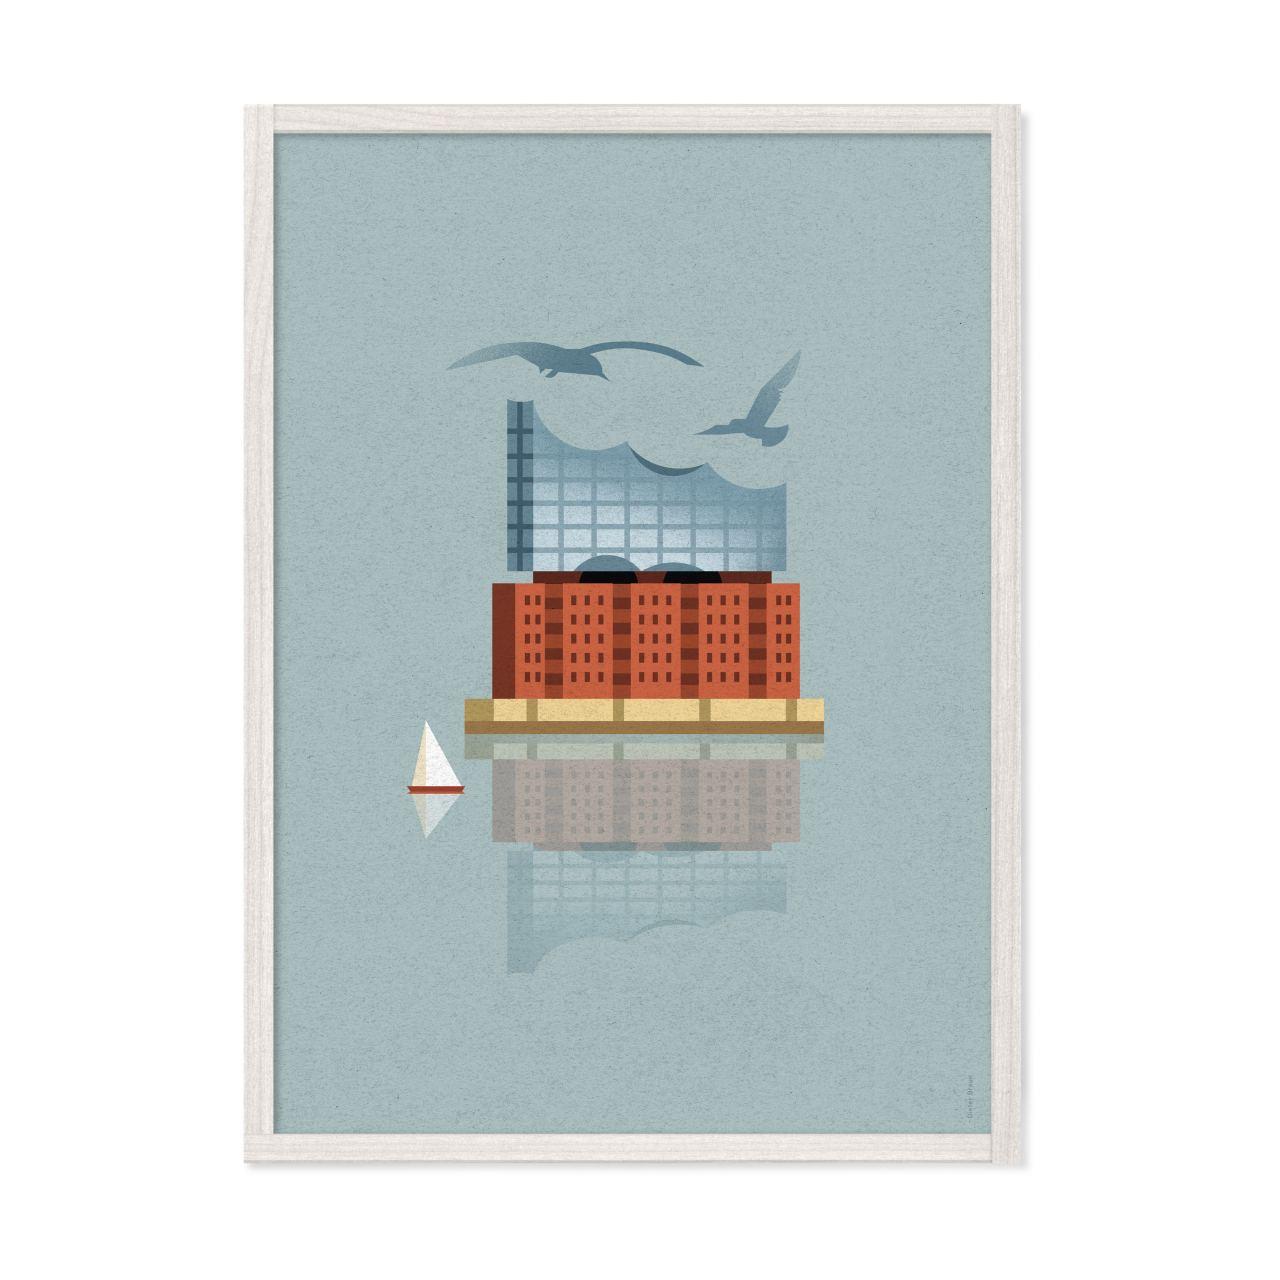 Elbphilharmonie Poster (29,7 x 42 cm) - Dieter Braun | Human Empire Shop